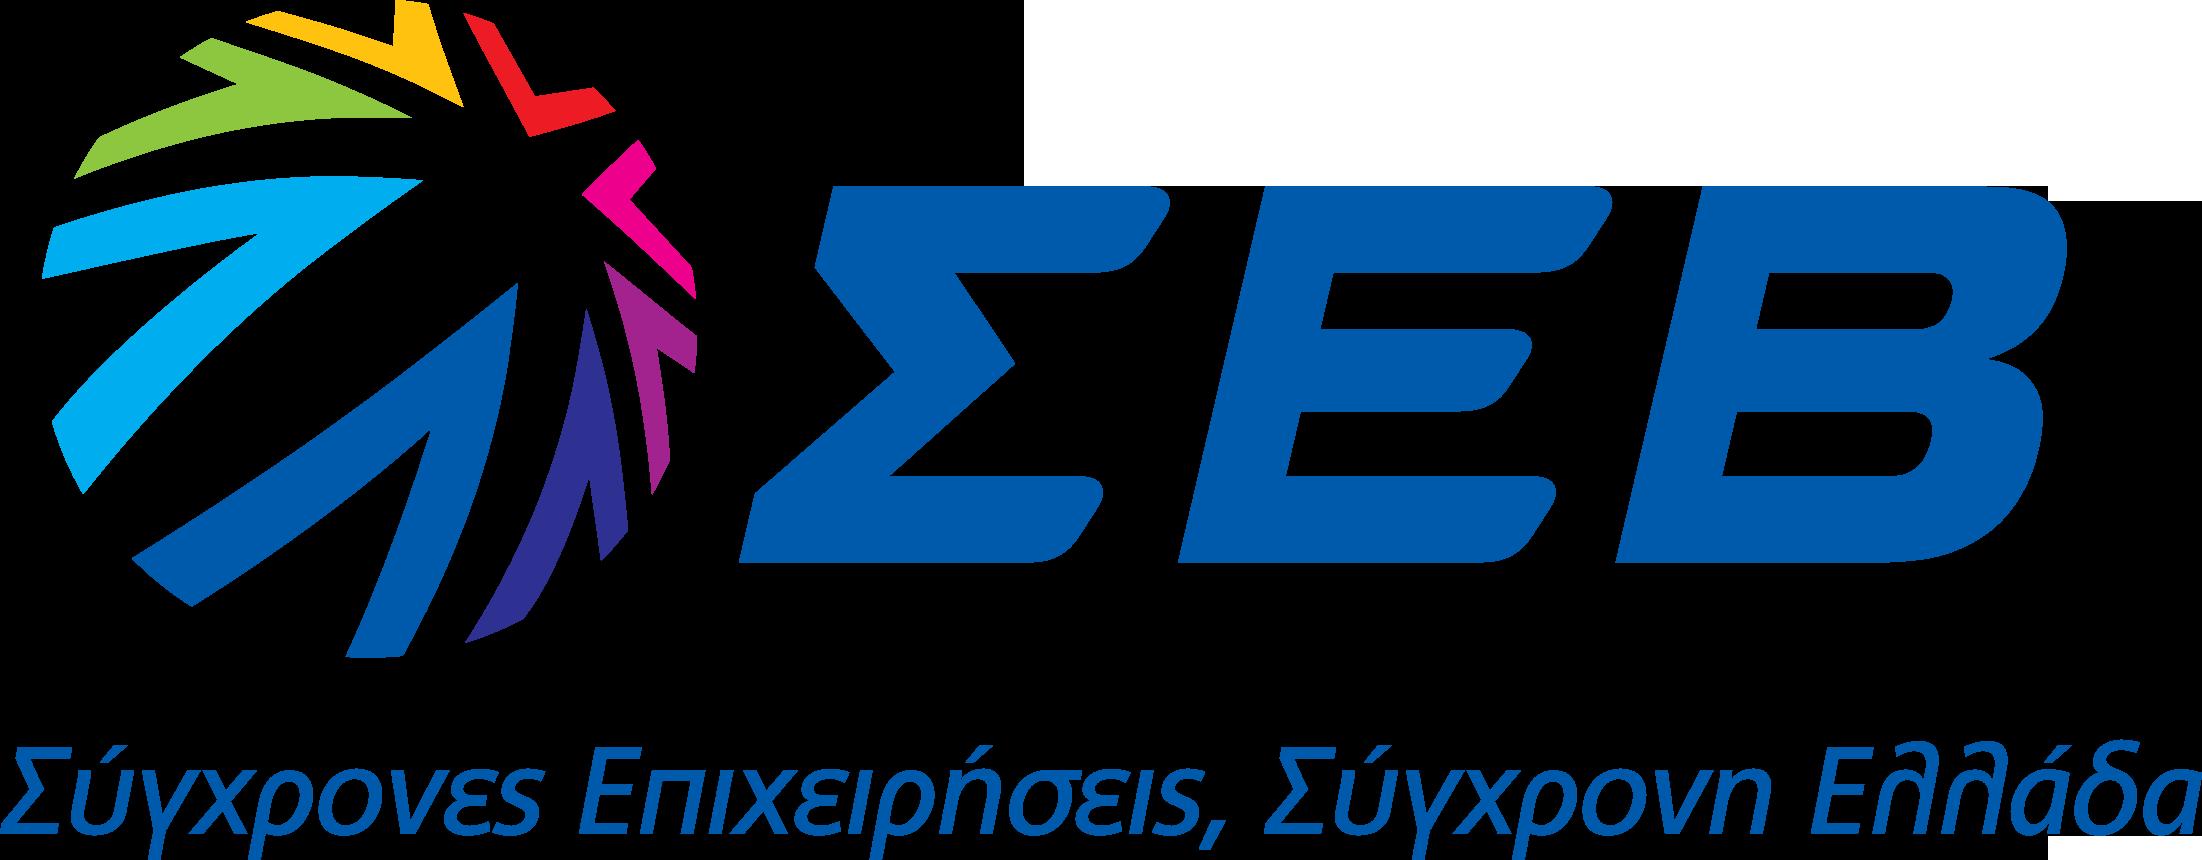 Sev logo